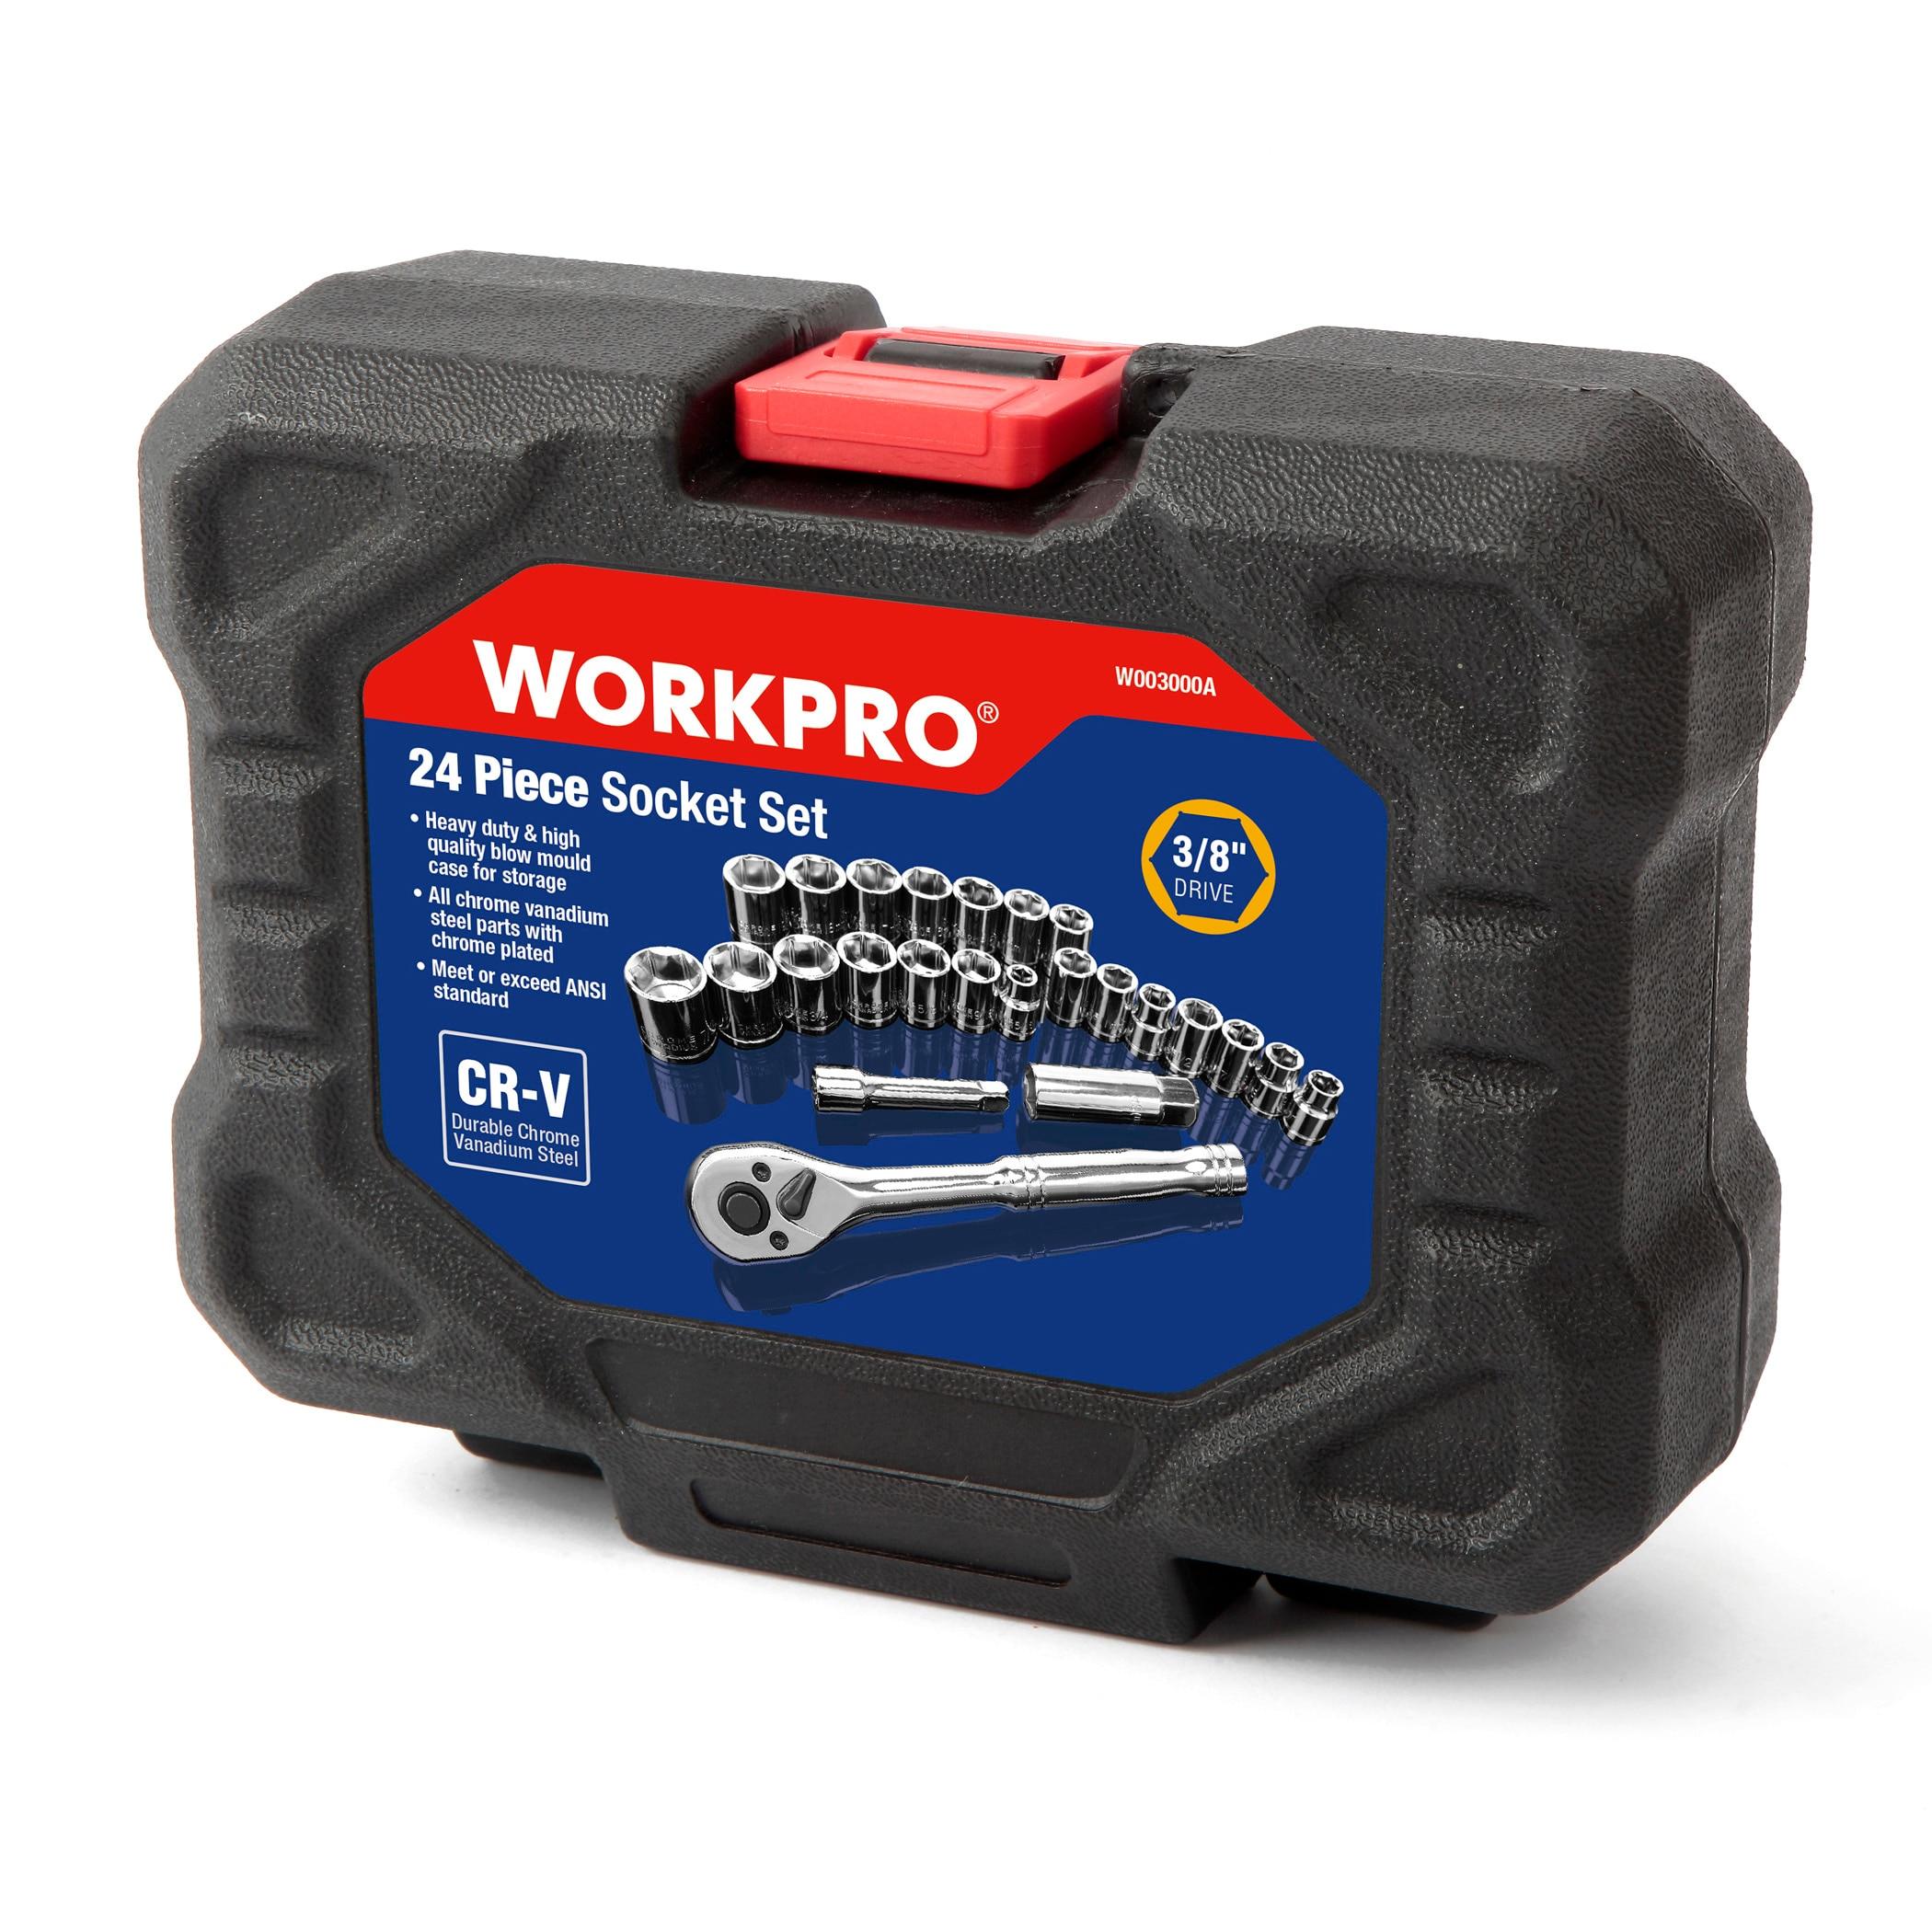 WORKPRO 24PC Tool Set Torque Wrench Socket Set 3/8″ Ratchet Wrench Socket Spanner (24Pcs)